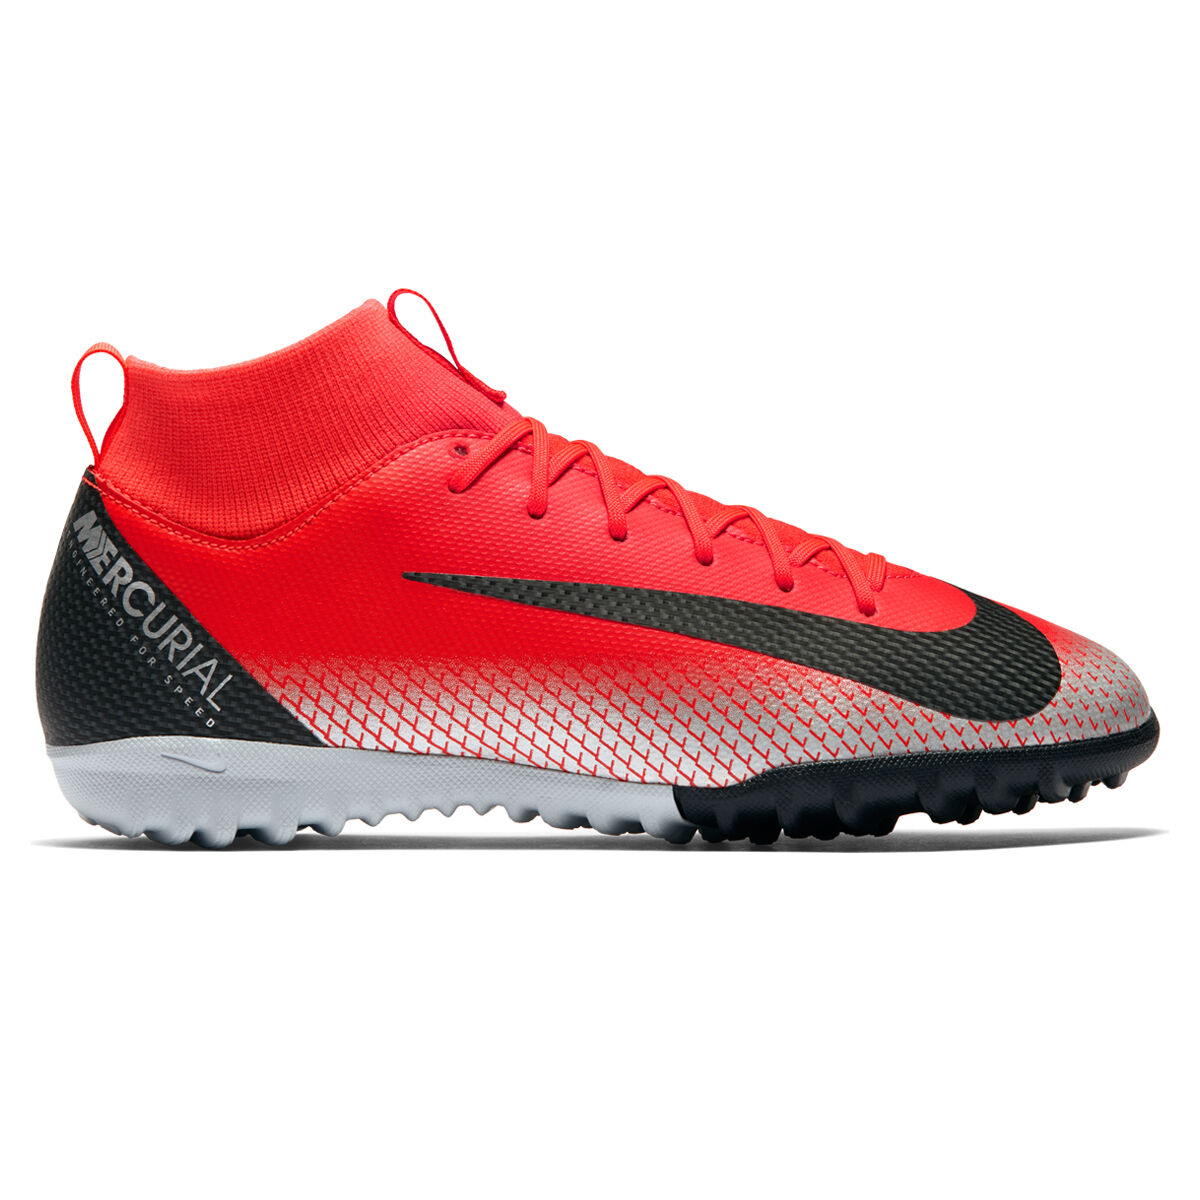 Nike Cr7 S Duffle Bags Myntra